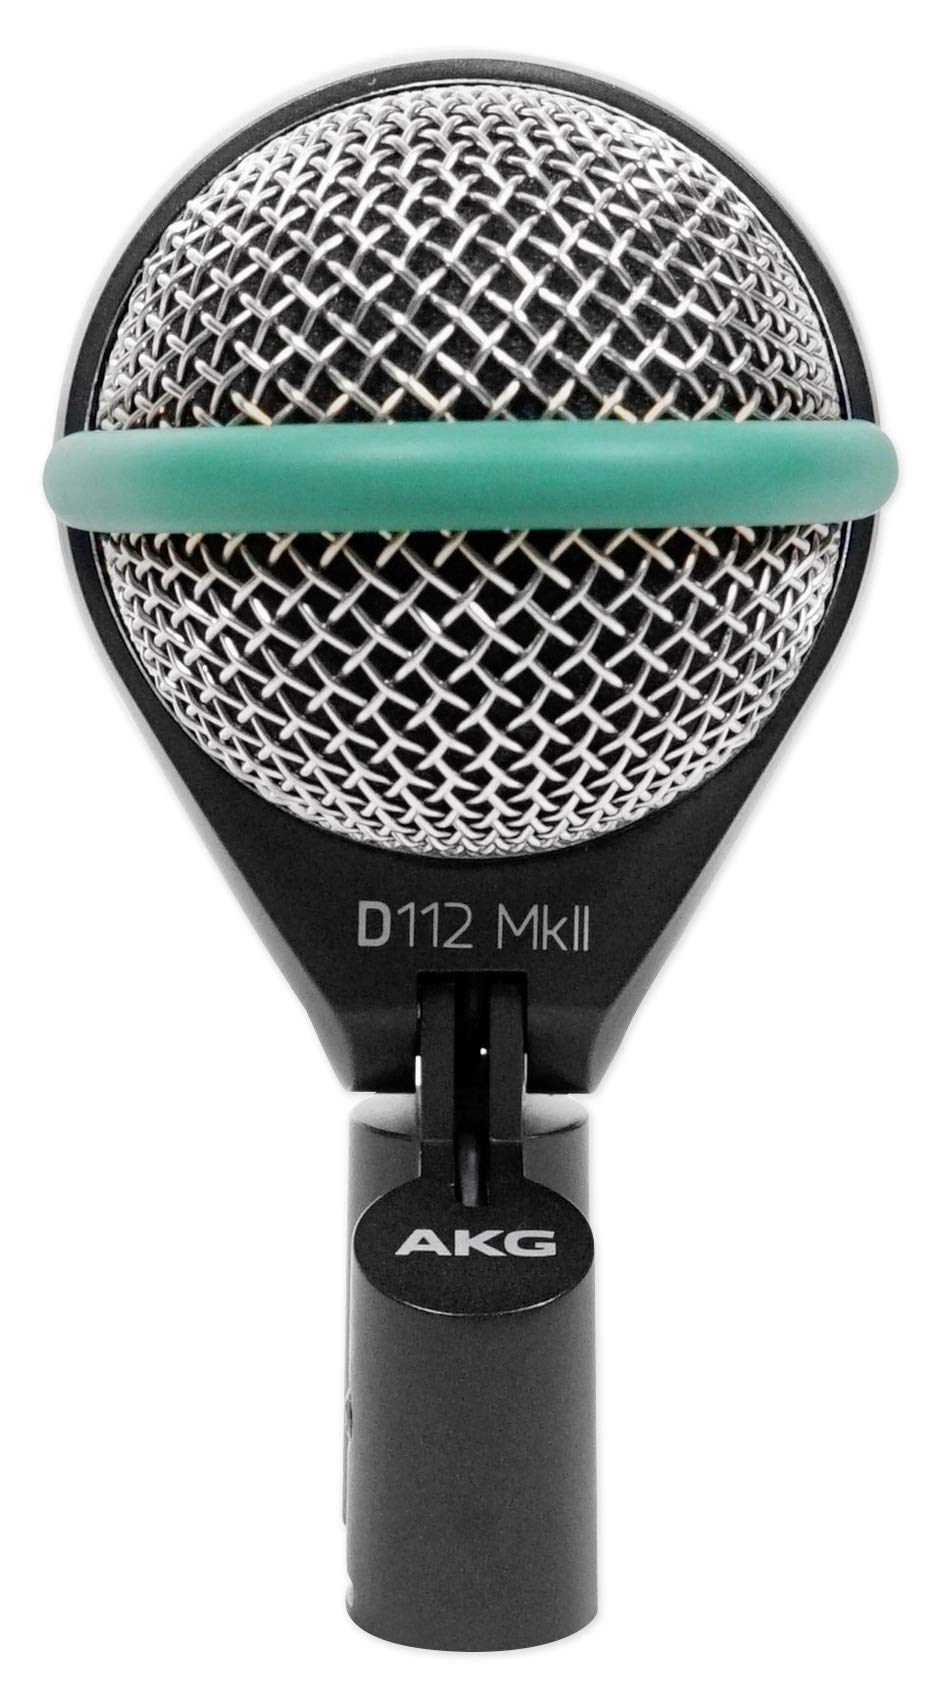 AKG D112 MkII Professional Microphone